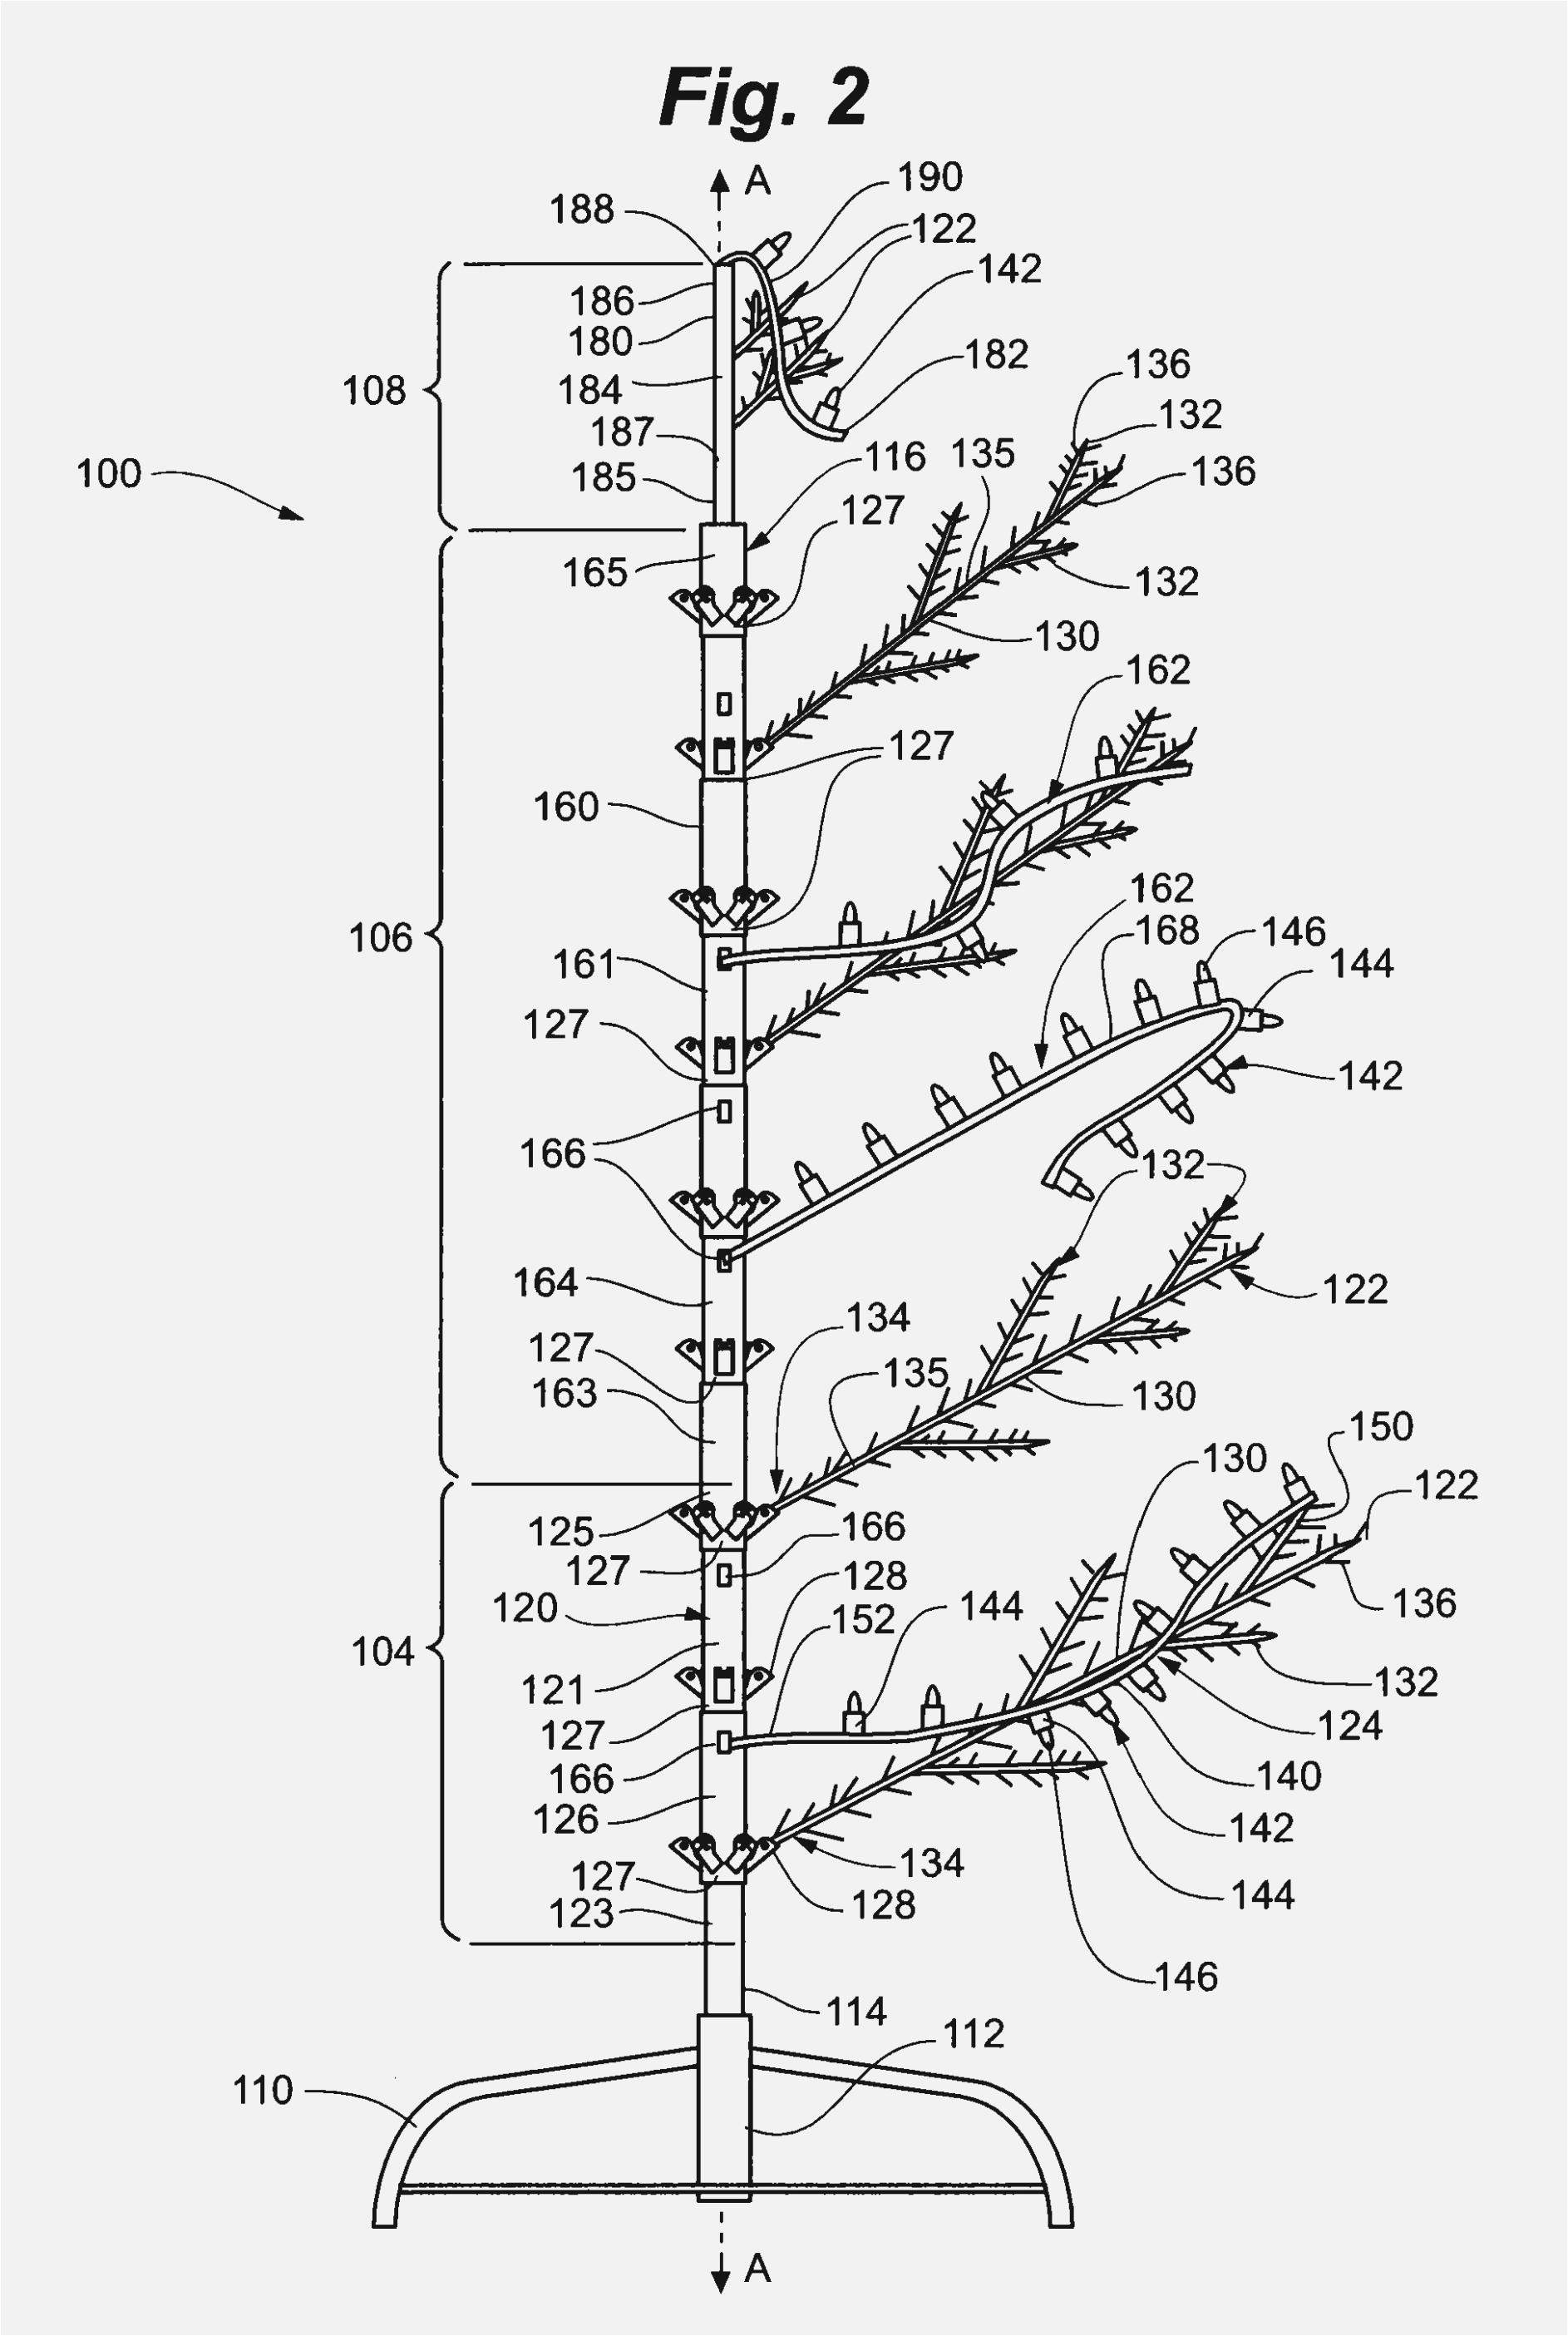 Pre Lit Christmas Tree Wiring Diagram Christmas Tree Wiring Diagram Free Download Schematic Wiring